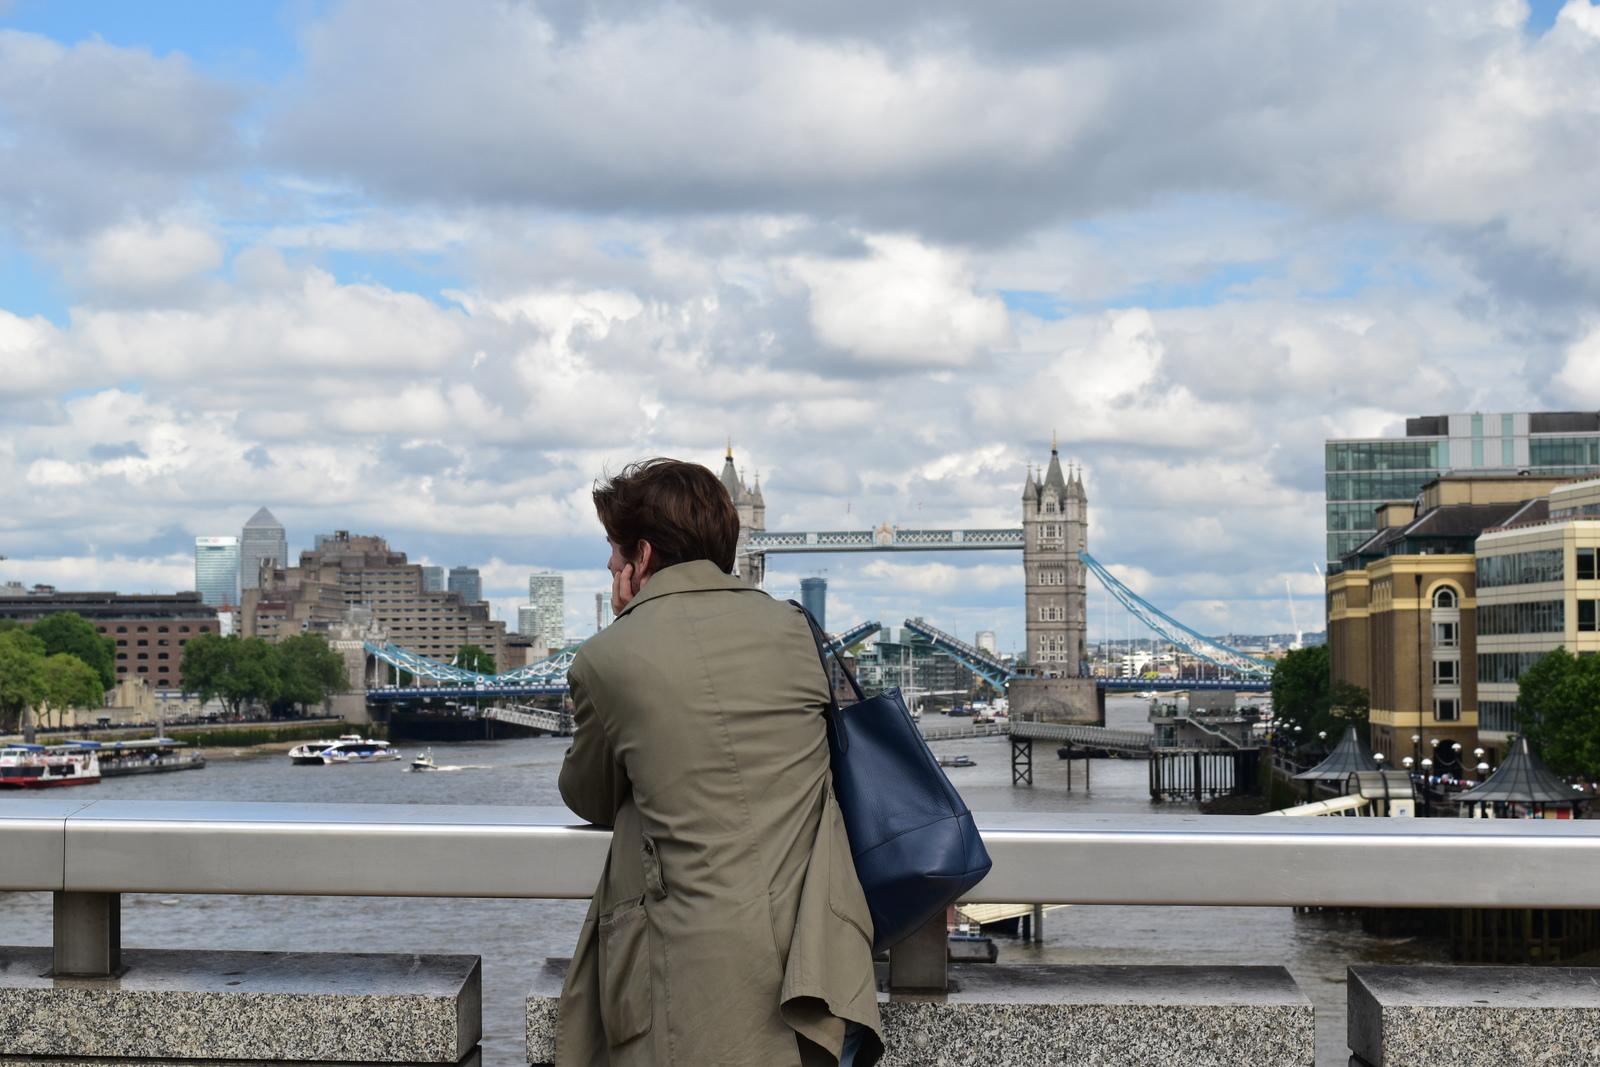 Days 7-8: London (32 photos)